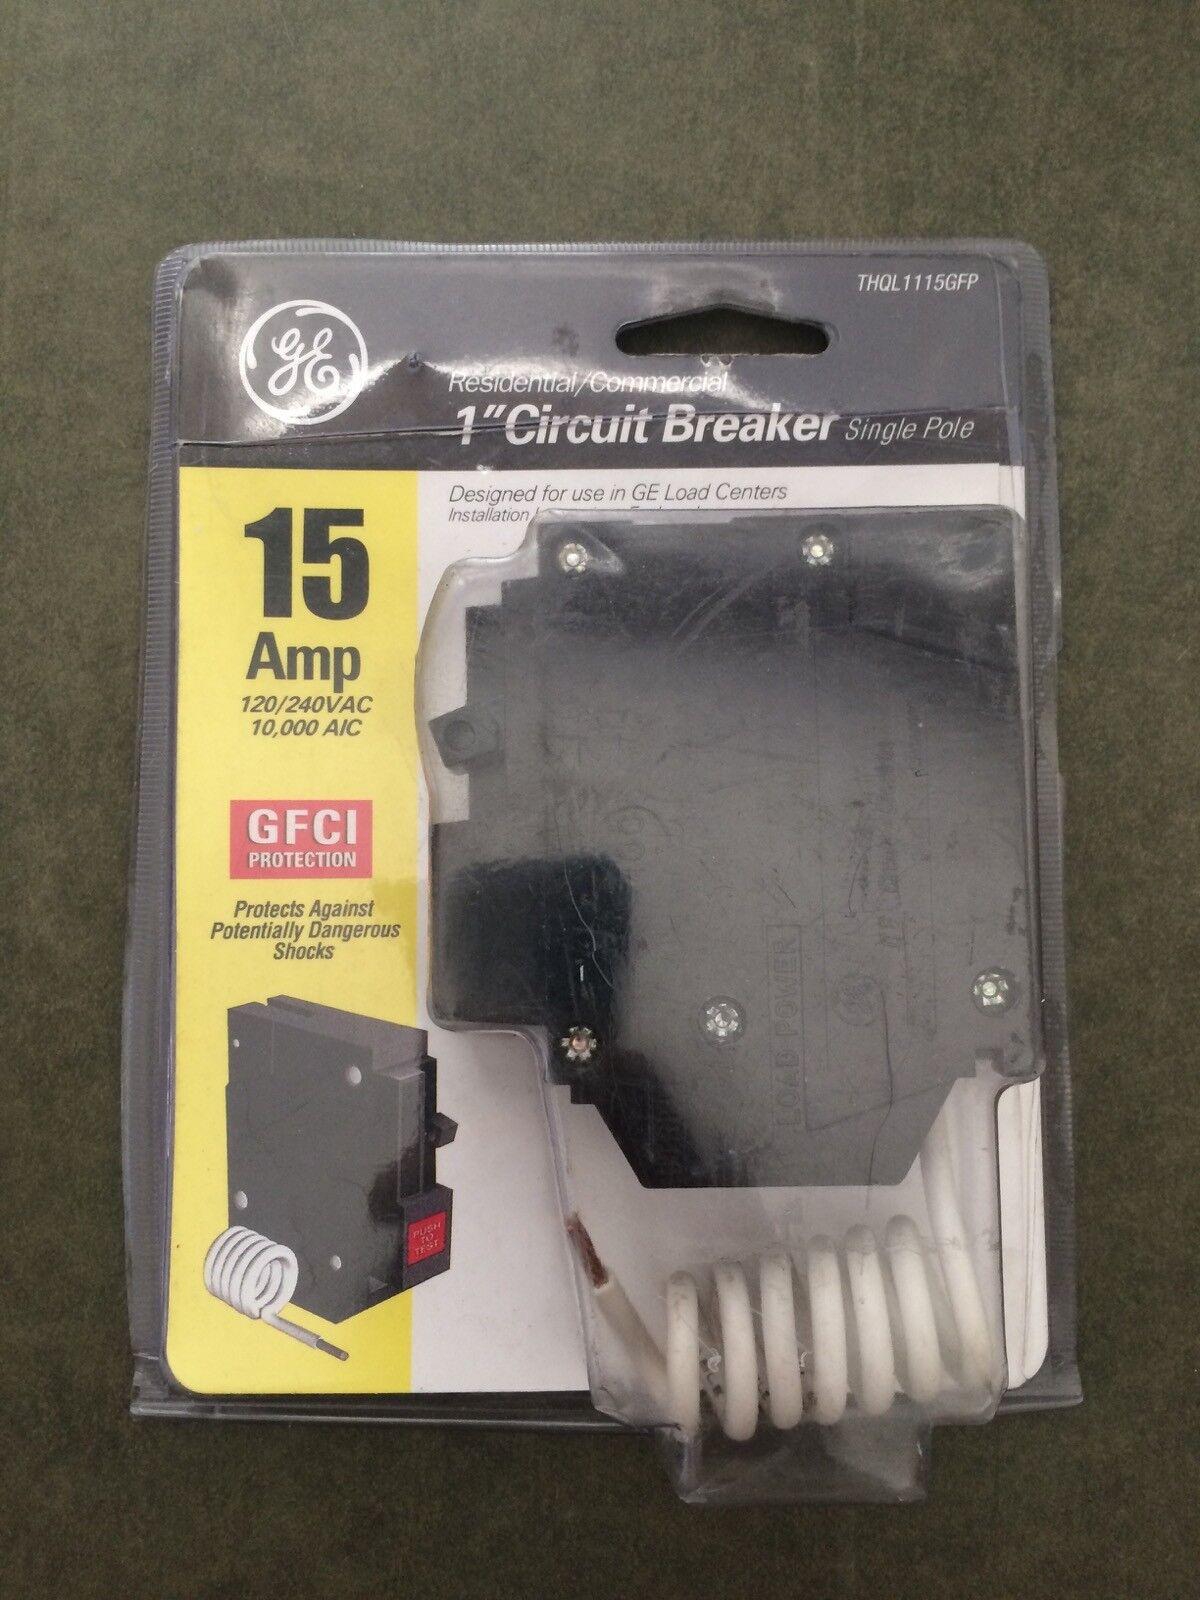 Ge 1 Circuit Breaker 15 Amp Pole Thql1115gfp Ebay Shop Qline Thql 20amp 1pole Ground Fault At